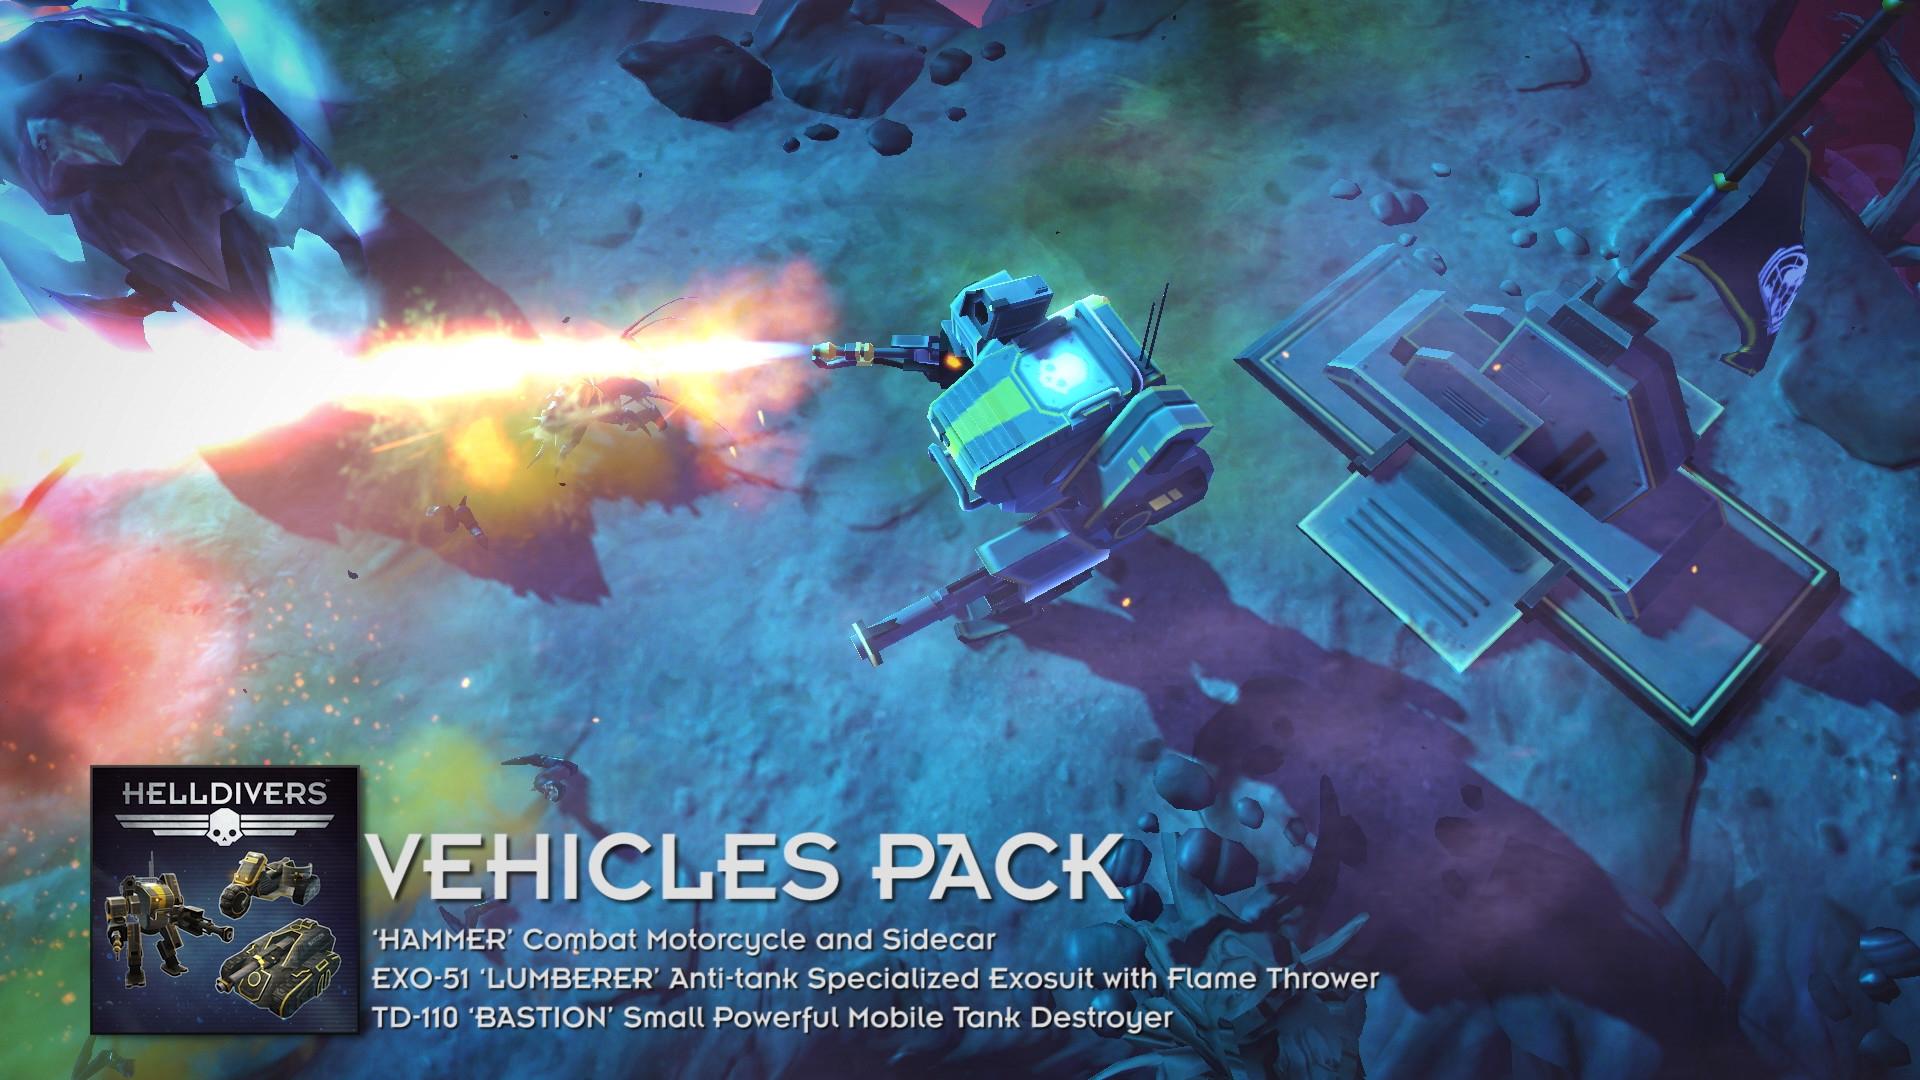 HELLDIVERS™ Vehicles Pack | WW (8e819e95-6612-4c88-ab63-7d128001cee6)